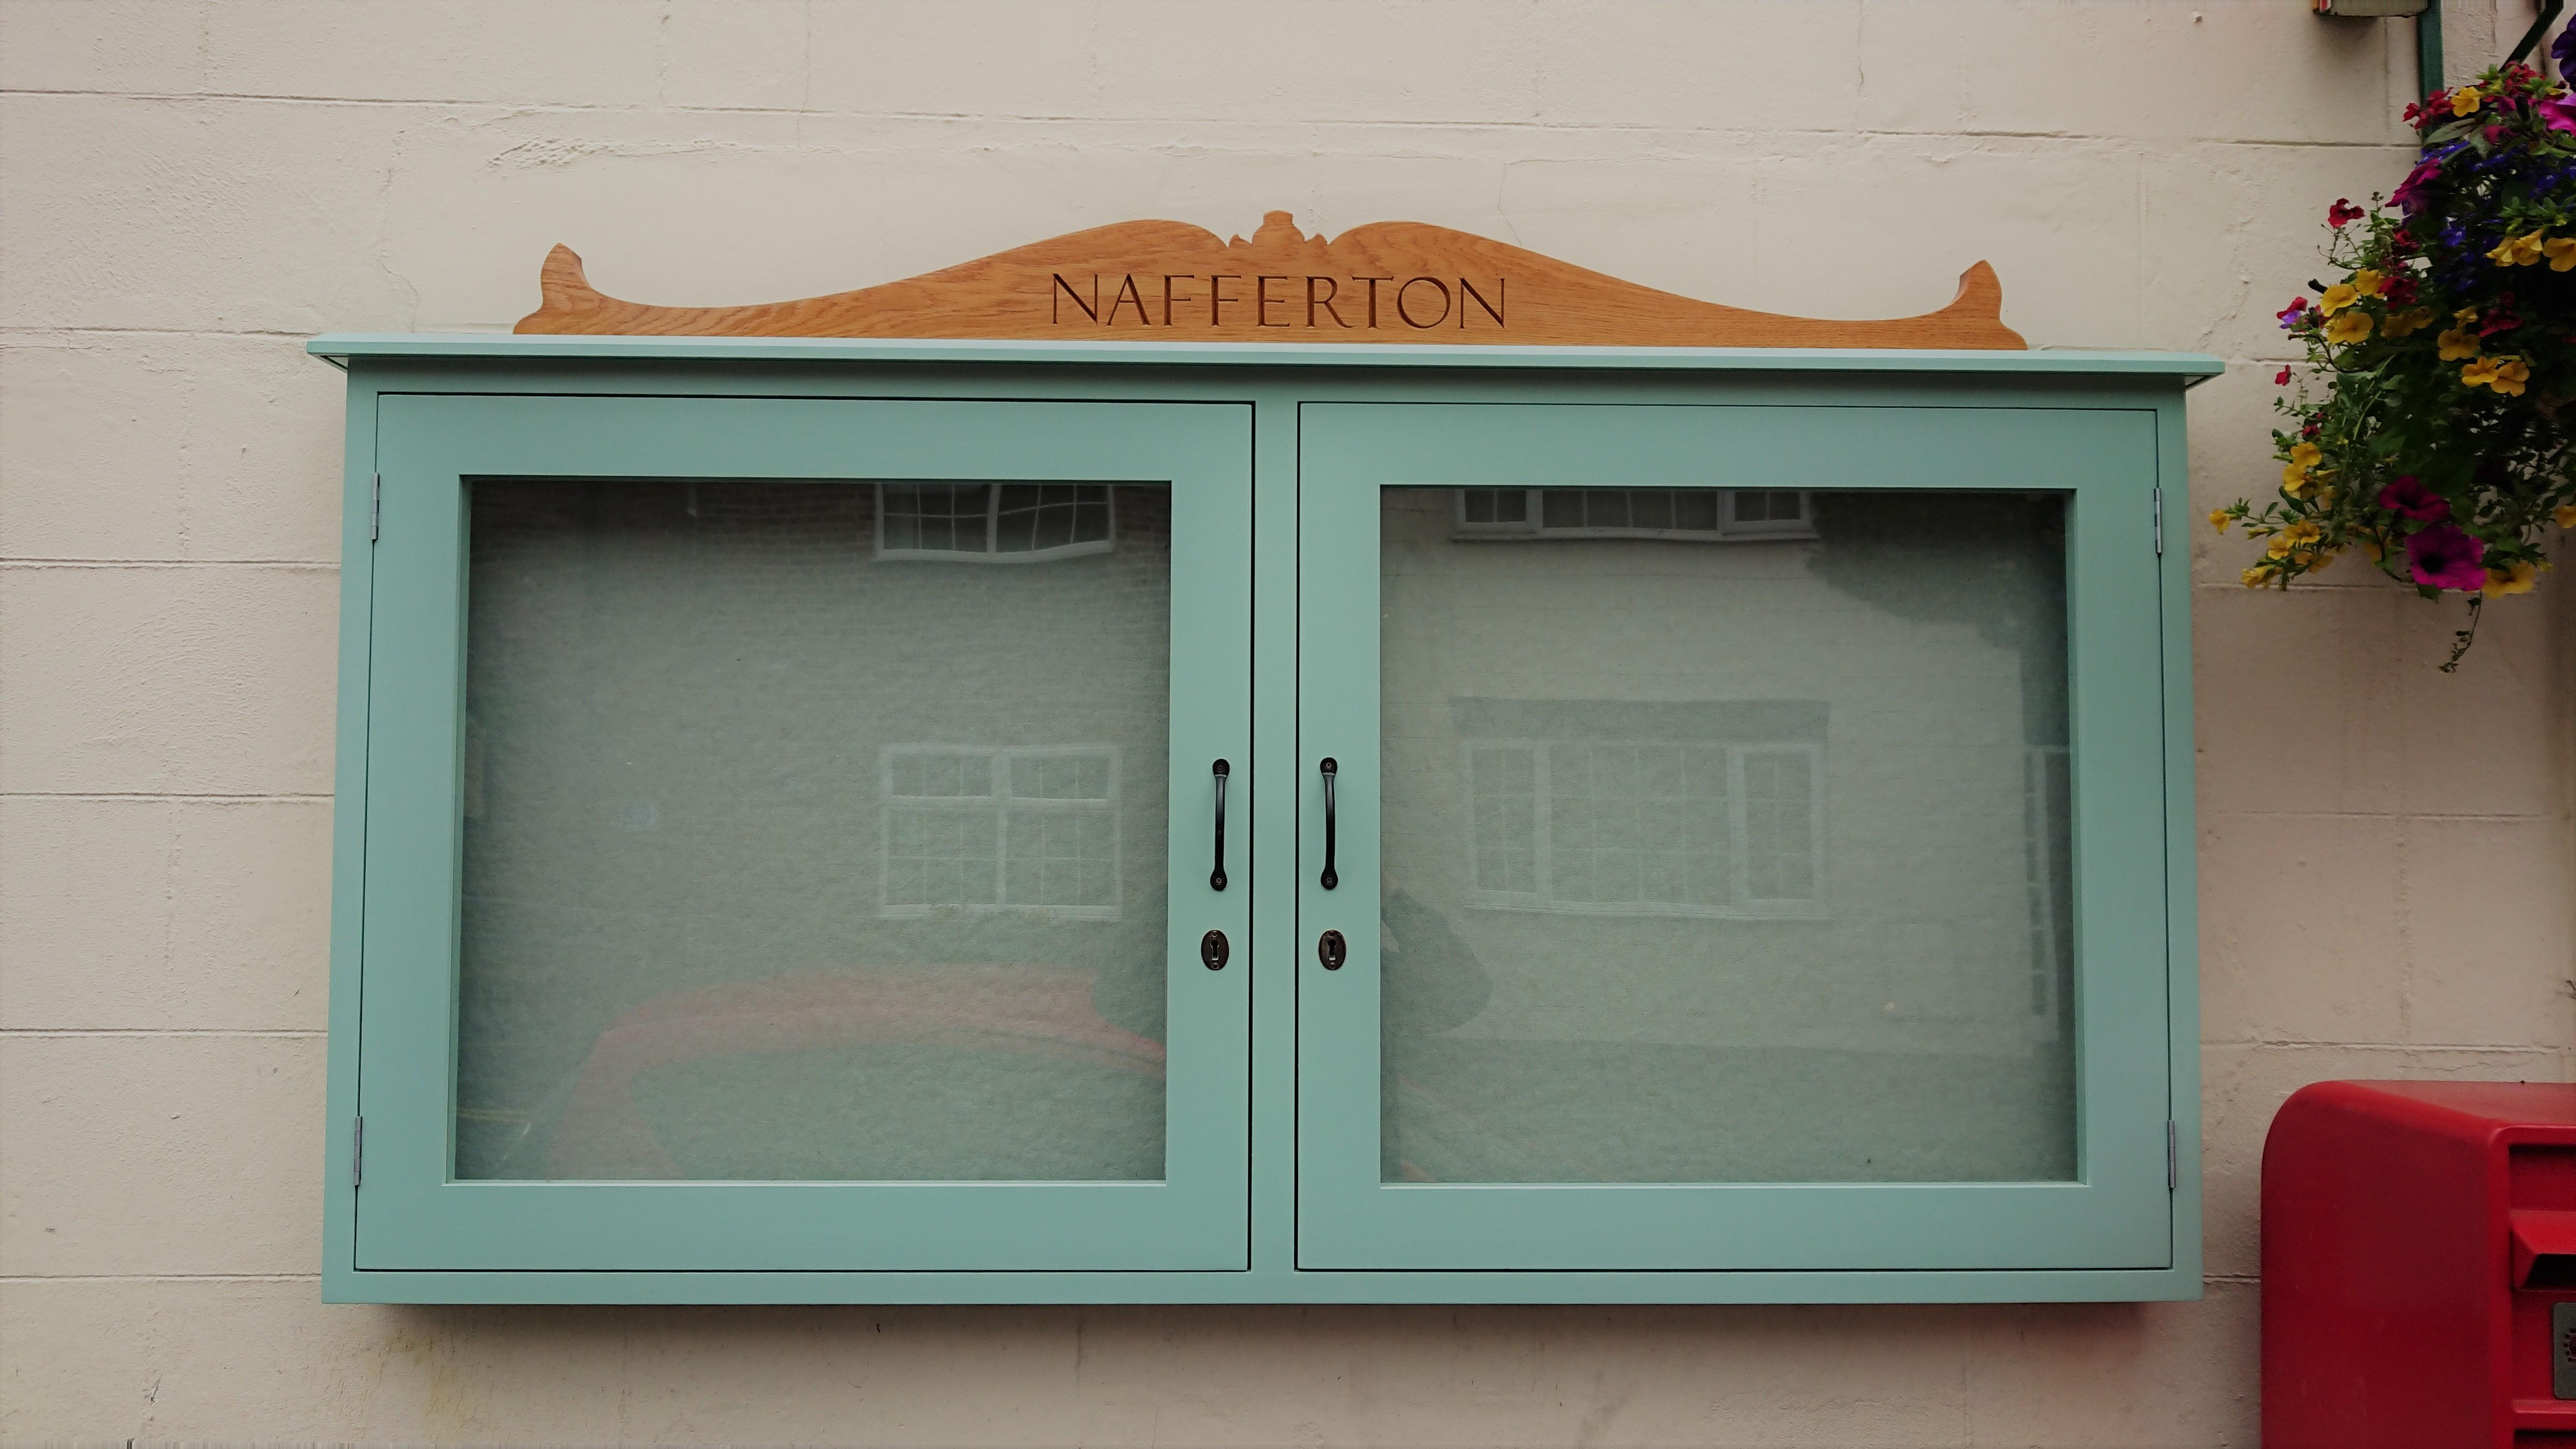 Nafferton